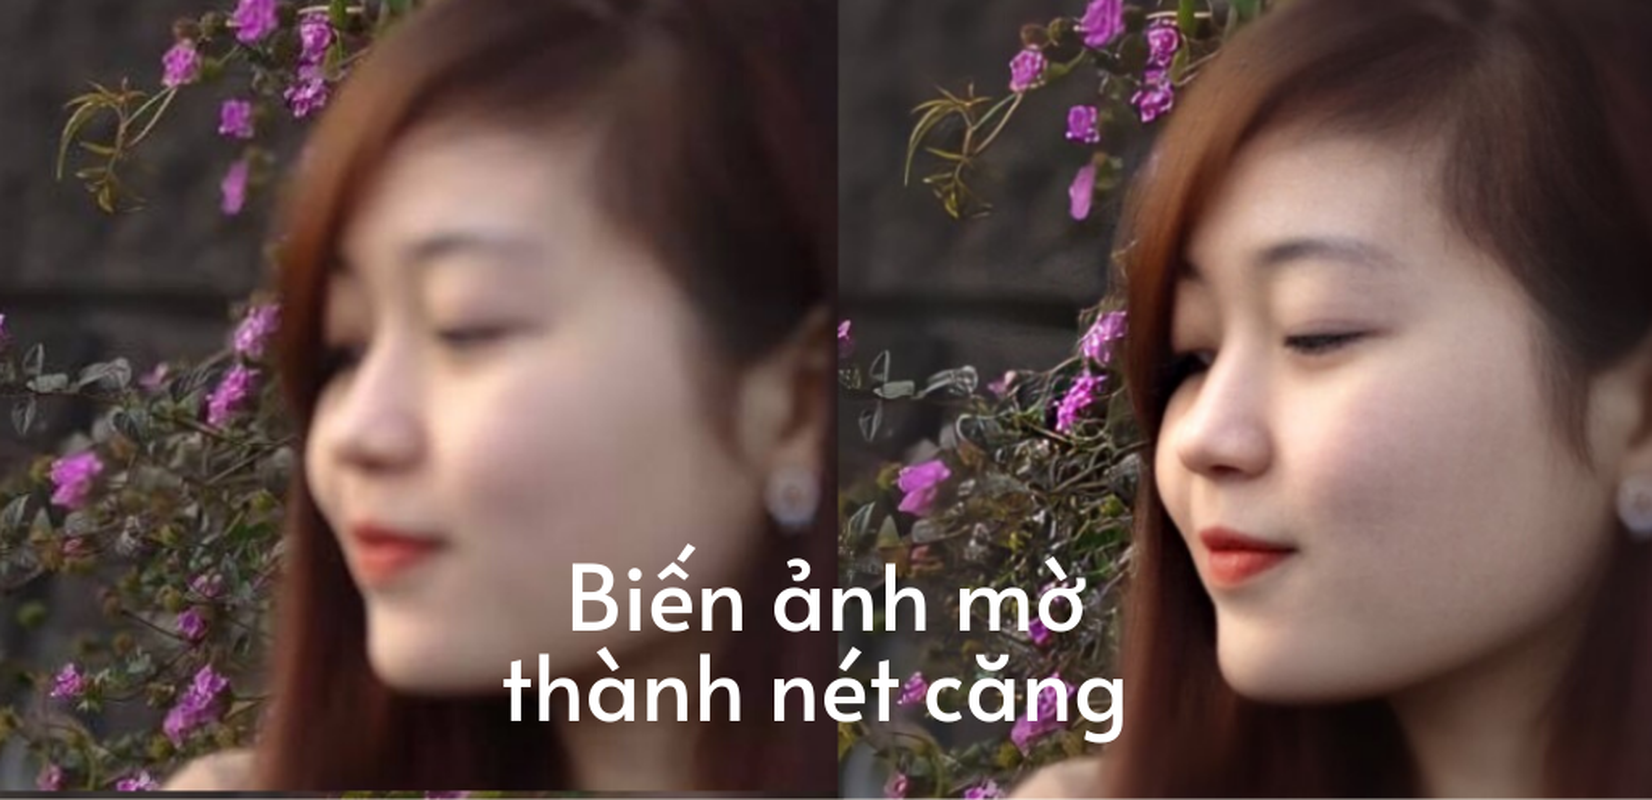 Dan tinh phat sot voi trao luu phuc che anh cu mo thanh net cang-Hinh-9